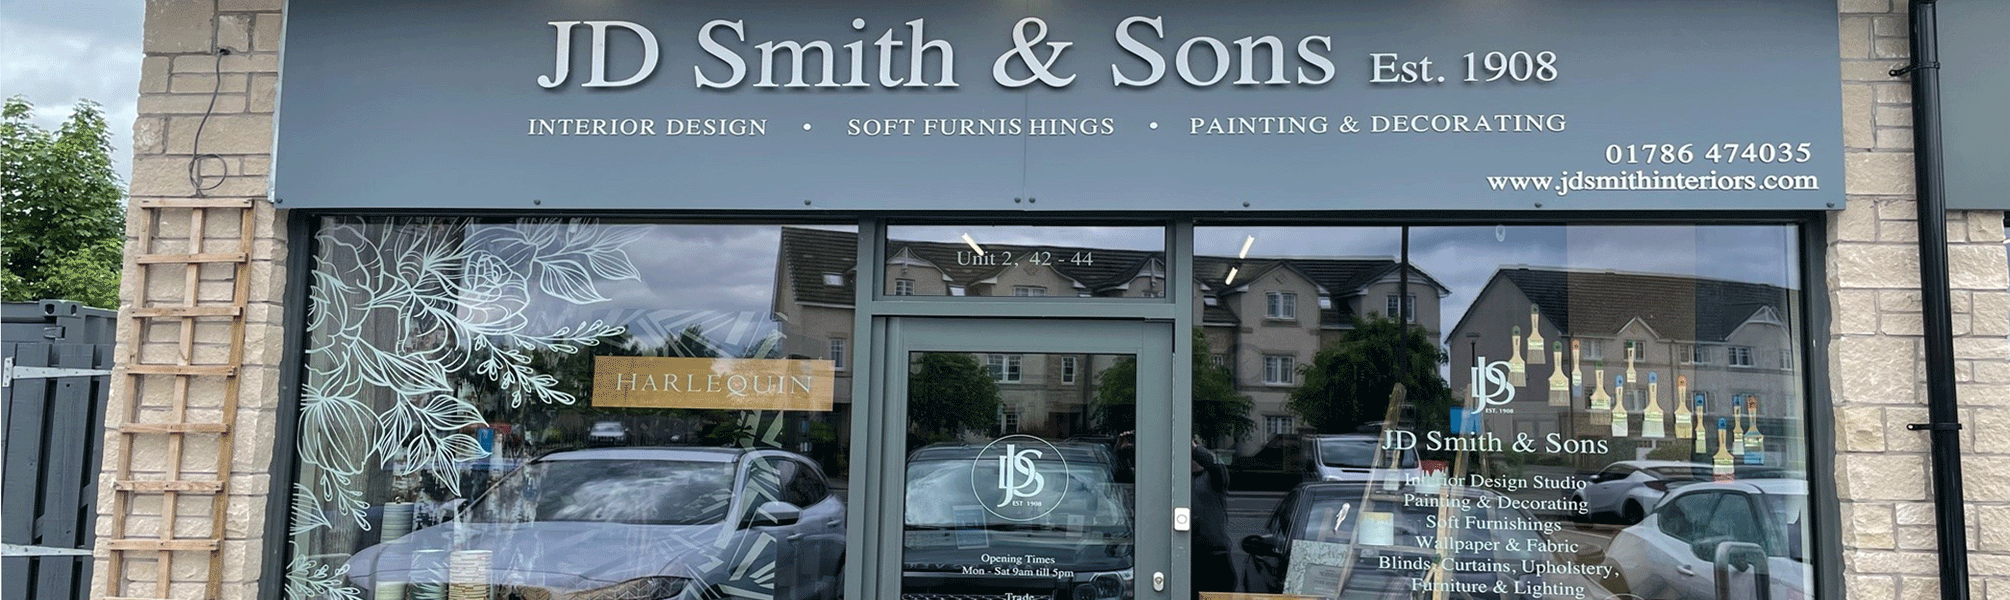 JD Smith Causewayhead-Paint-Decorate